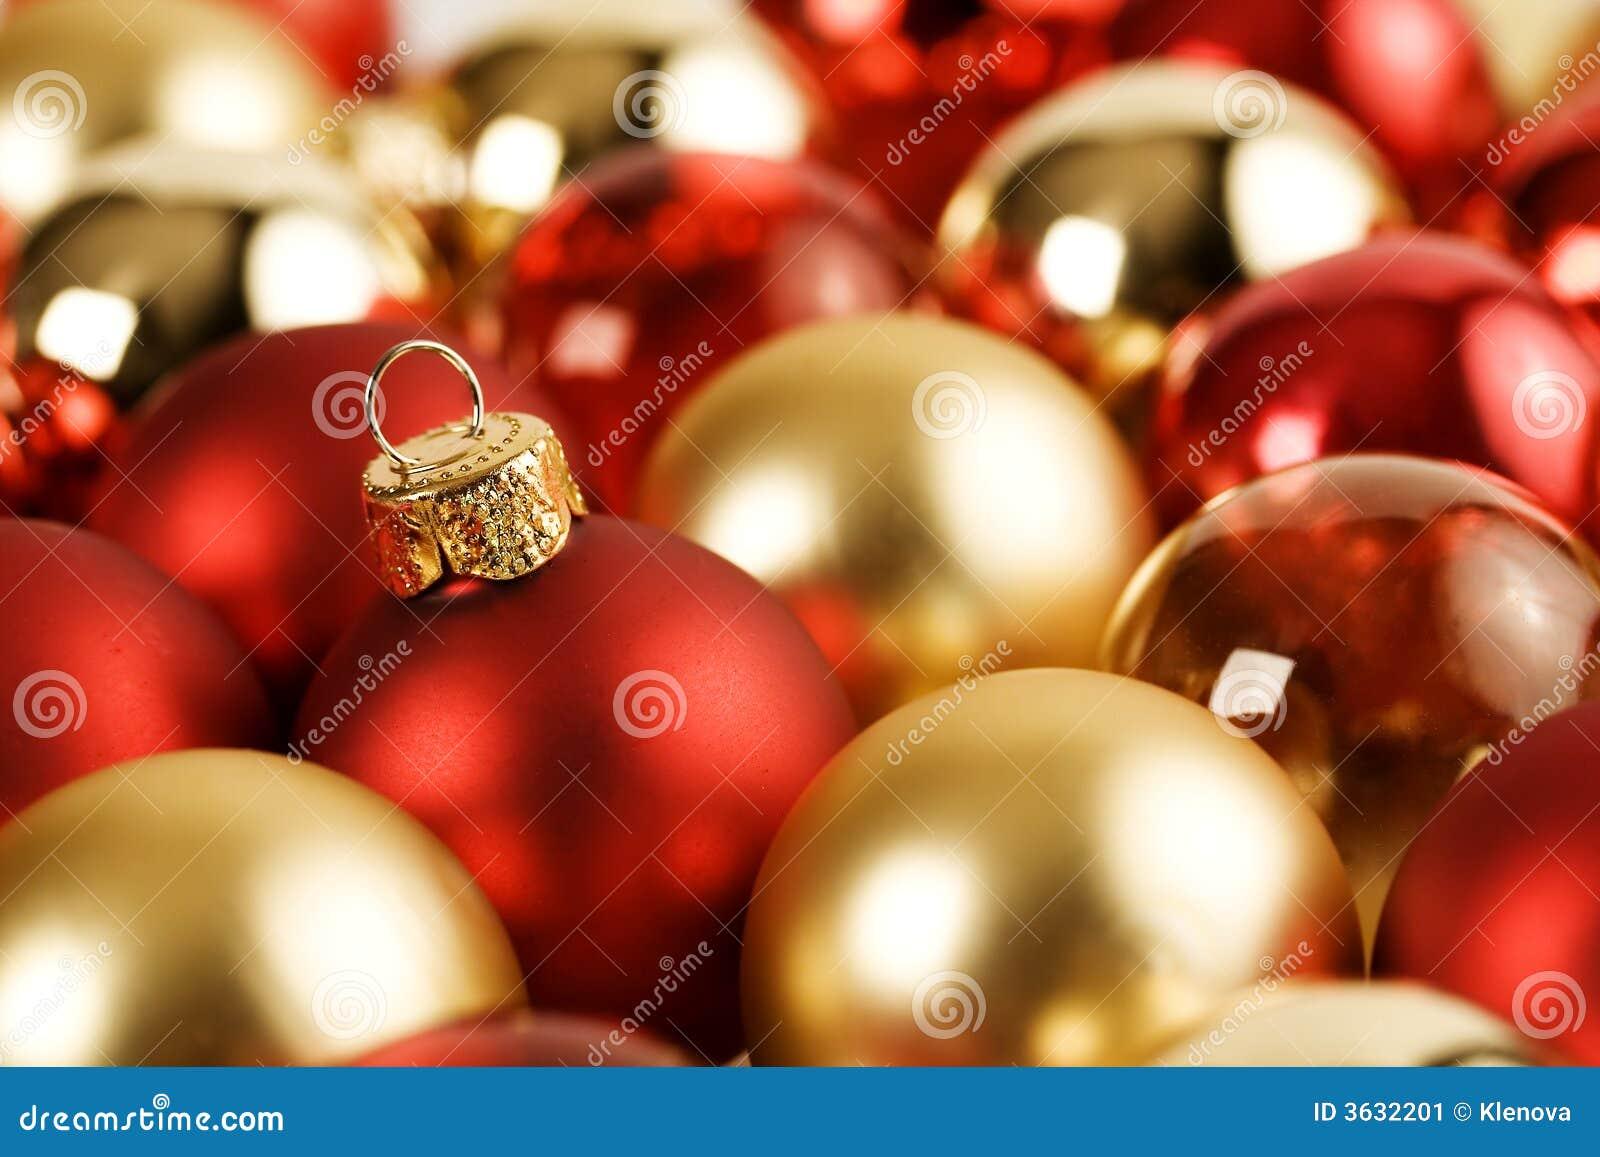 gold rot weihnachtskugeln stockbild bild 3632201. Black Bedroom Furniture Sets. Home Design Ideas